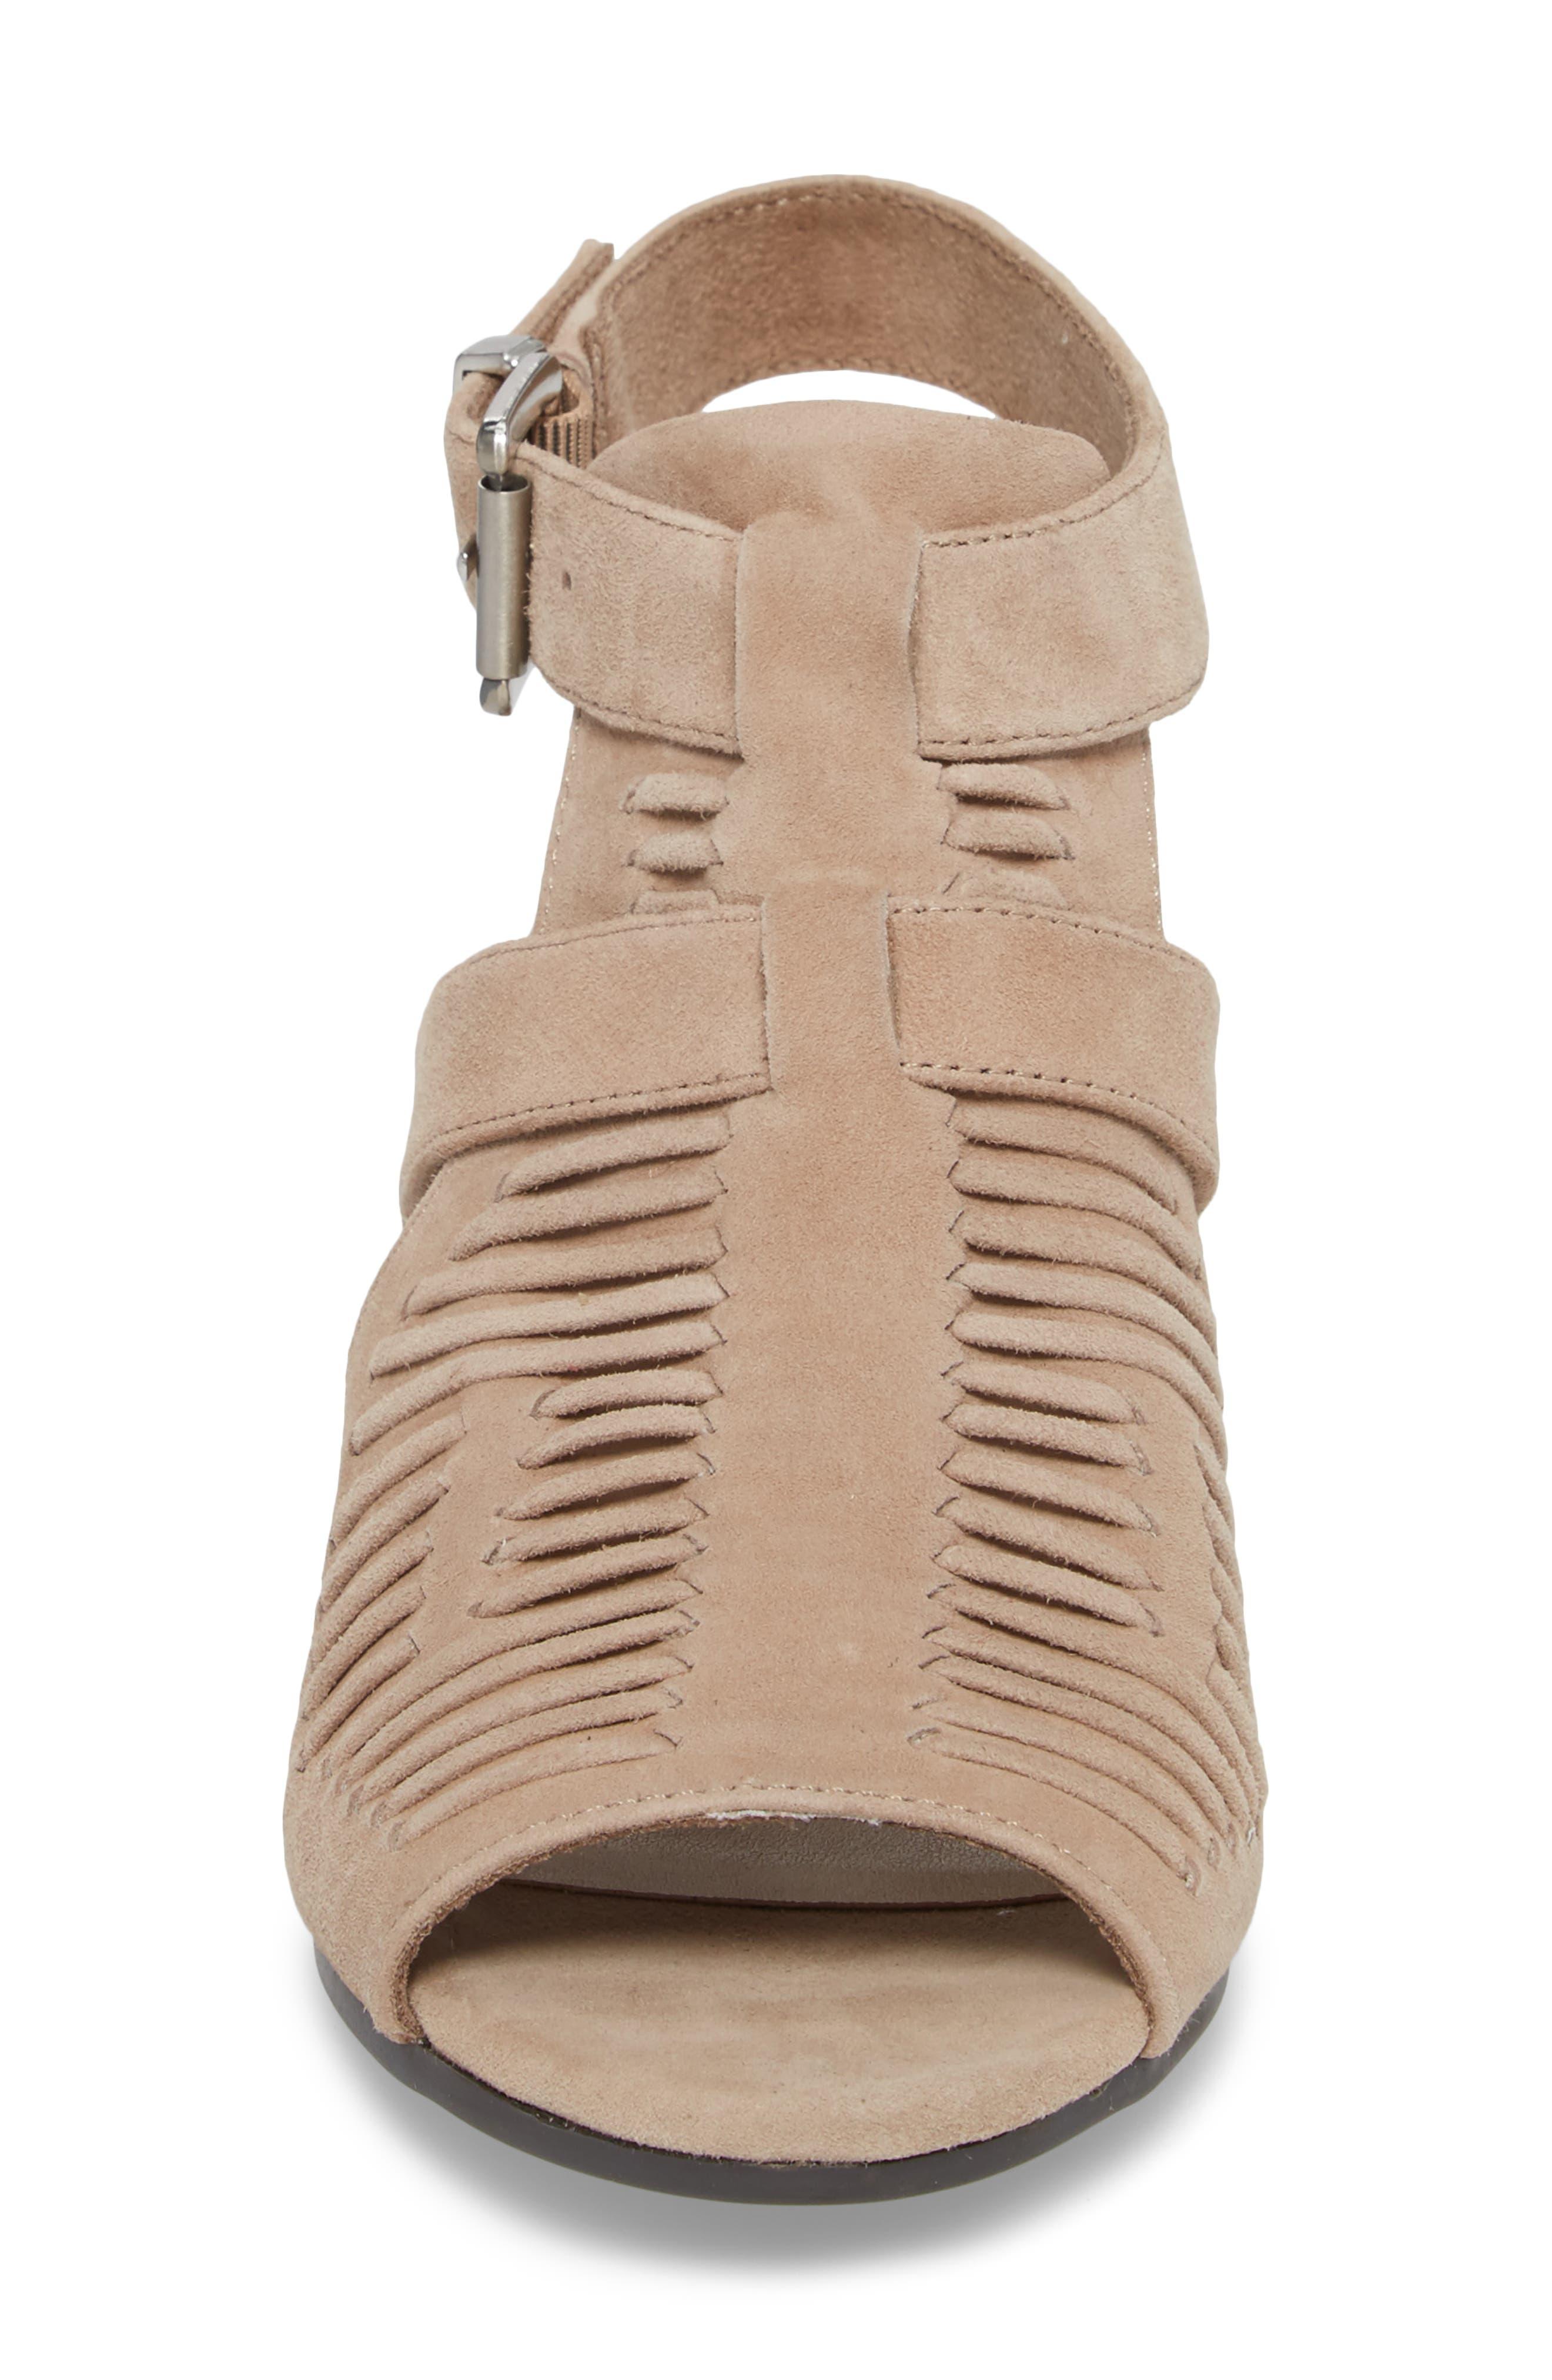 Finley Ankle Strap Sandal,                             Alternate thumbnail 19, color,